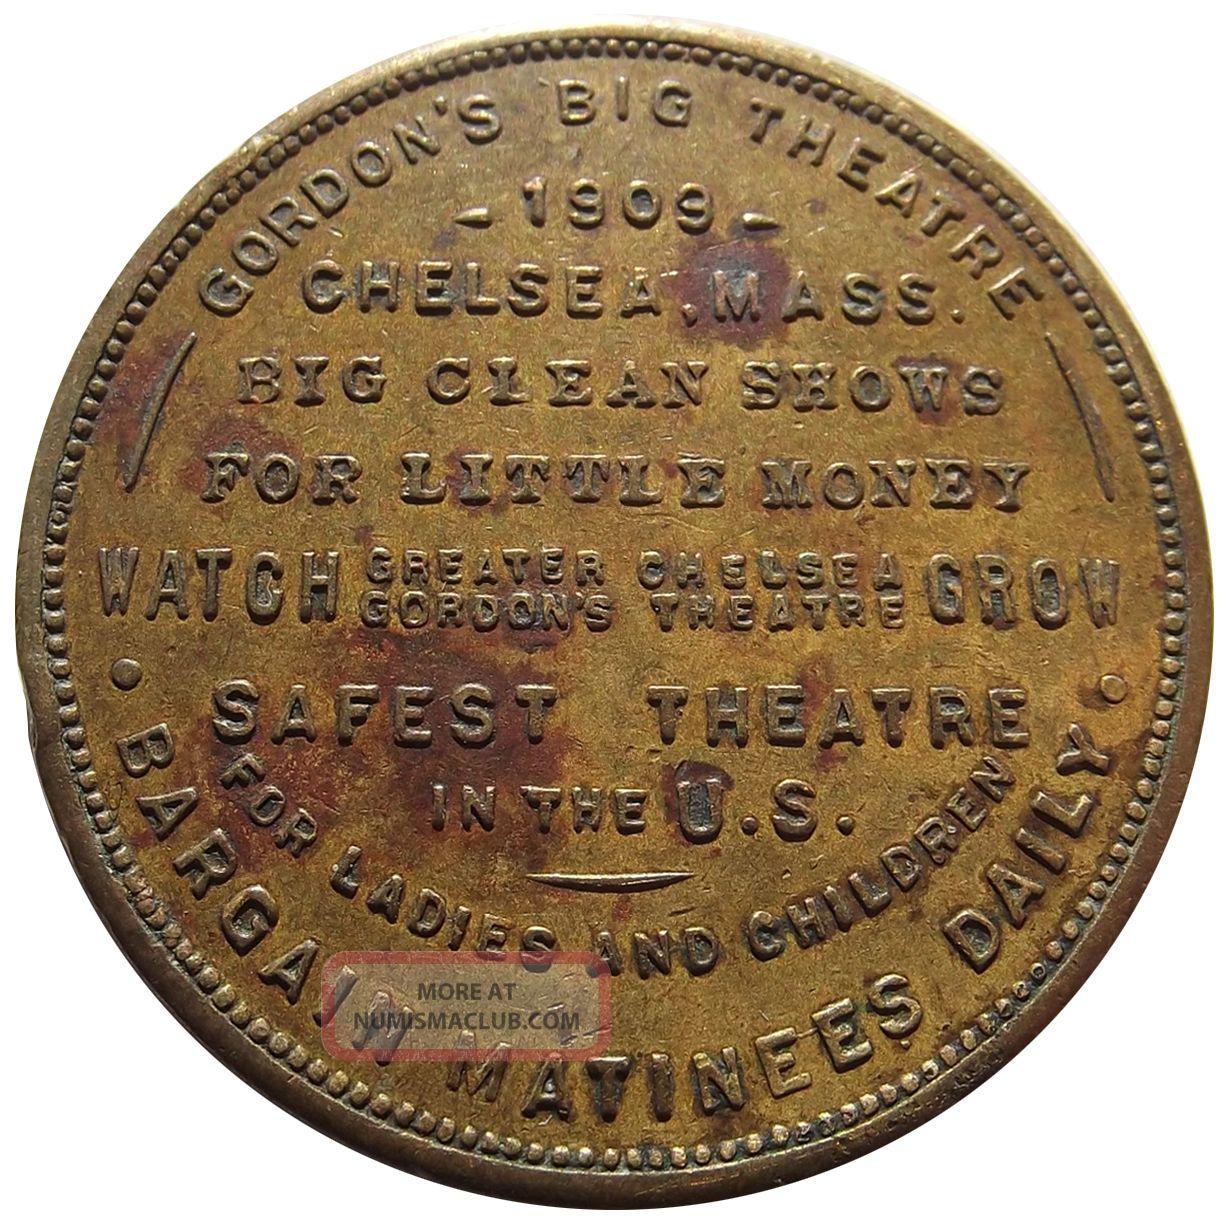 1909 Massachusetts Token - Gordon ' S Big Theatre,  Chelsea,  Ma,  Good Luck Swastika Exonumia photo